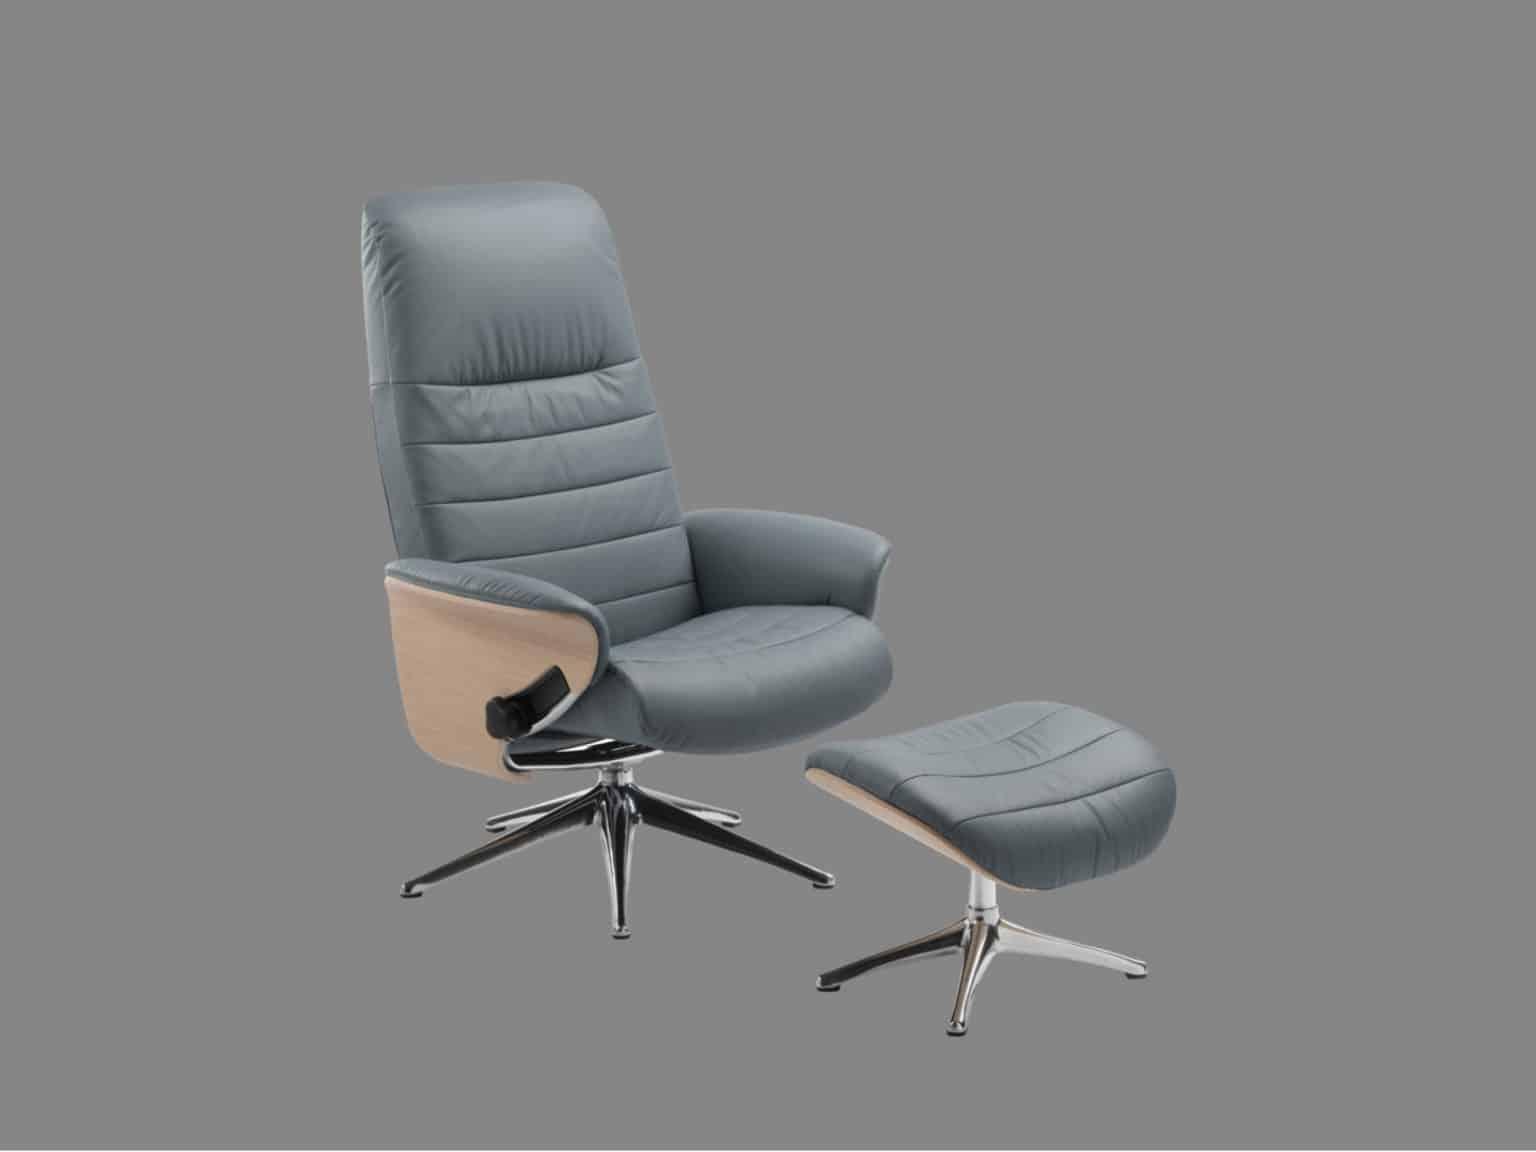 Flexlux fauteuil Horizon sf